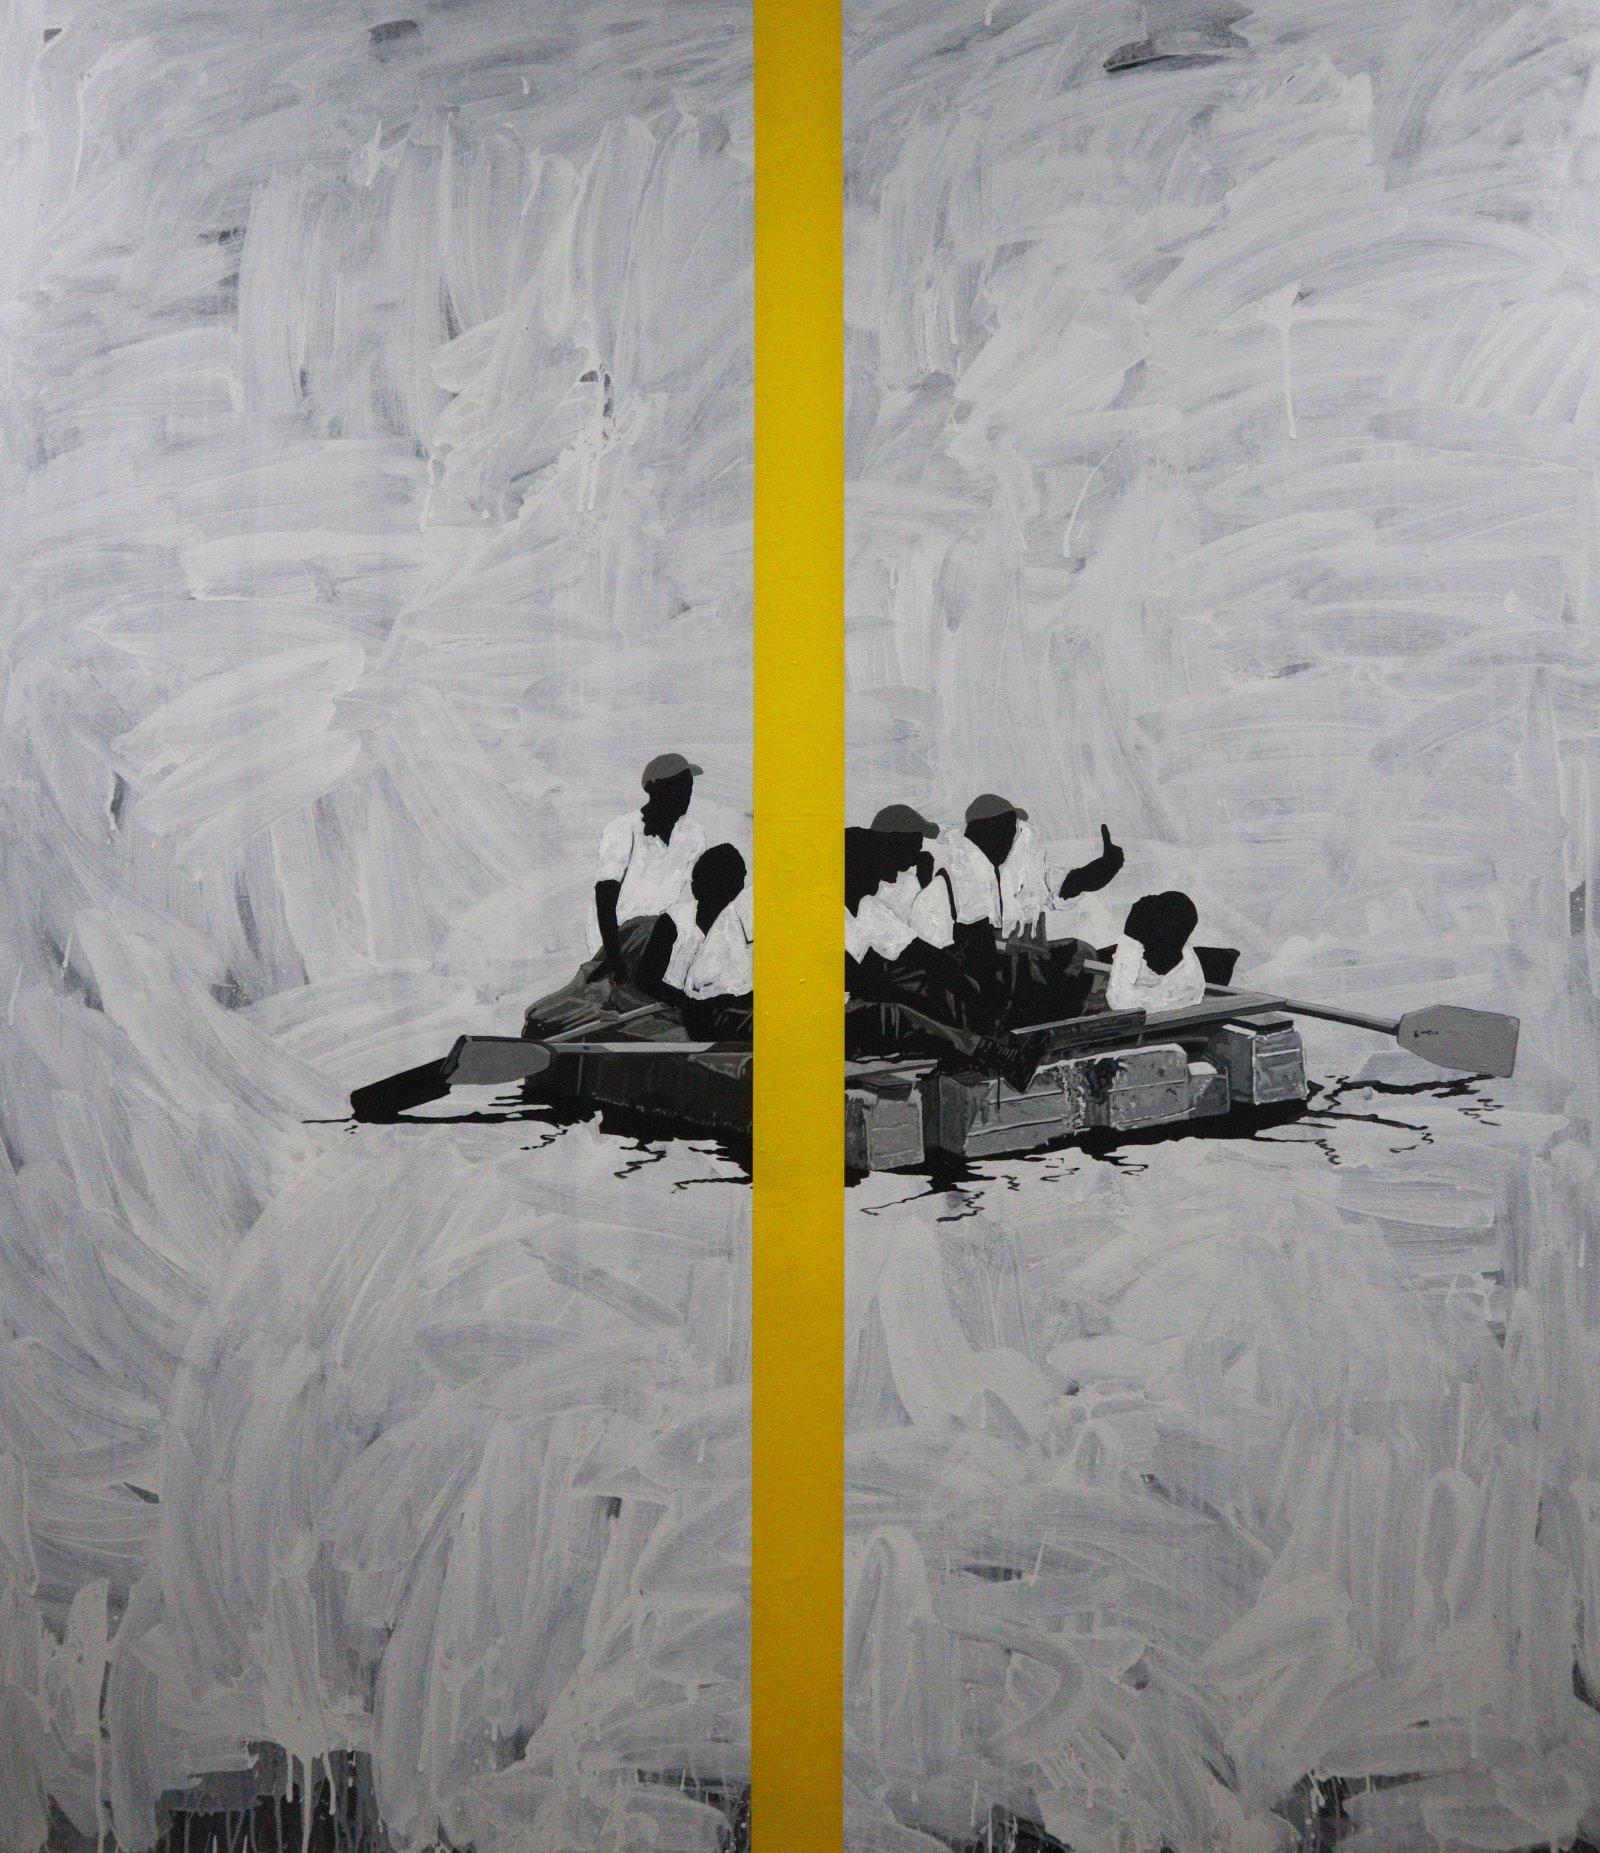 balseros (2020) - Leo Moyano